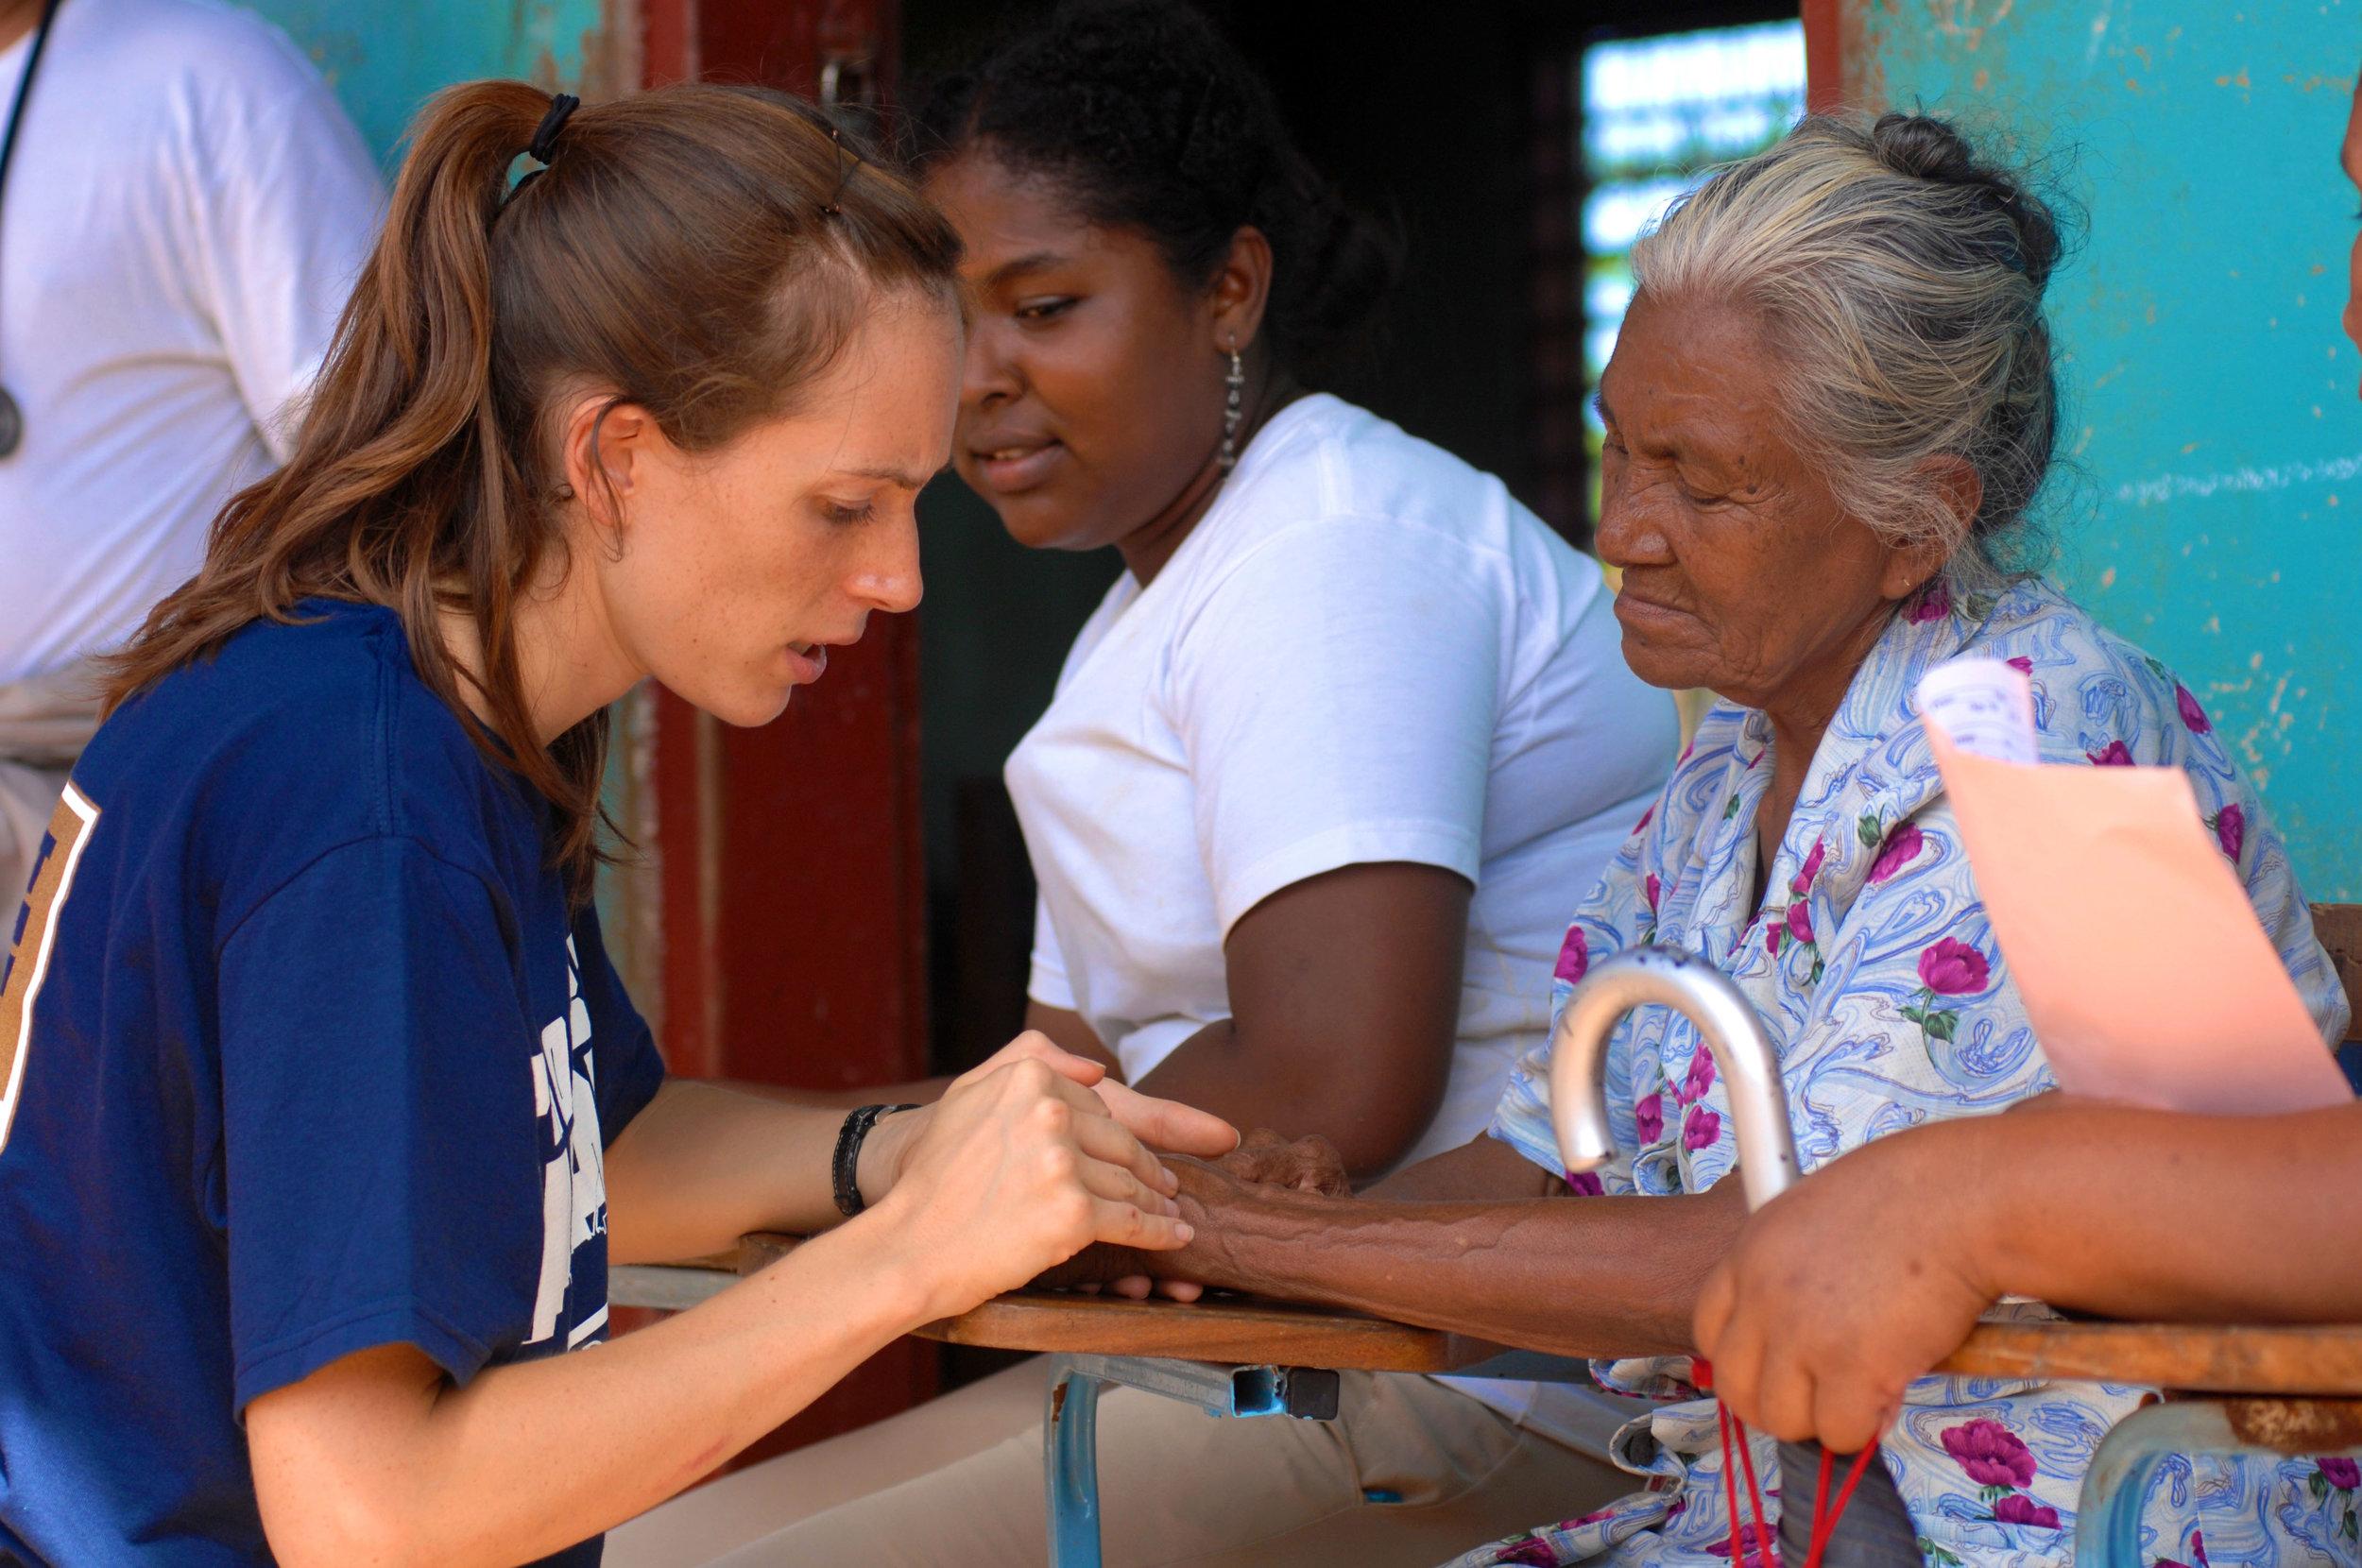 US_Navy_080815-N-7540C-148_Project_Hope_volunteer_Sara_Joyce,_embarked_aboard_the_amphibious_assault_ship_USS_Kearsarge_(LHD_3),_examines_the_hand_of_an_elderly_Nicaraguan_woman.jpg